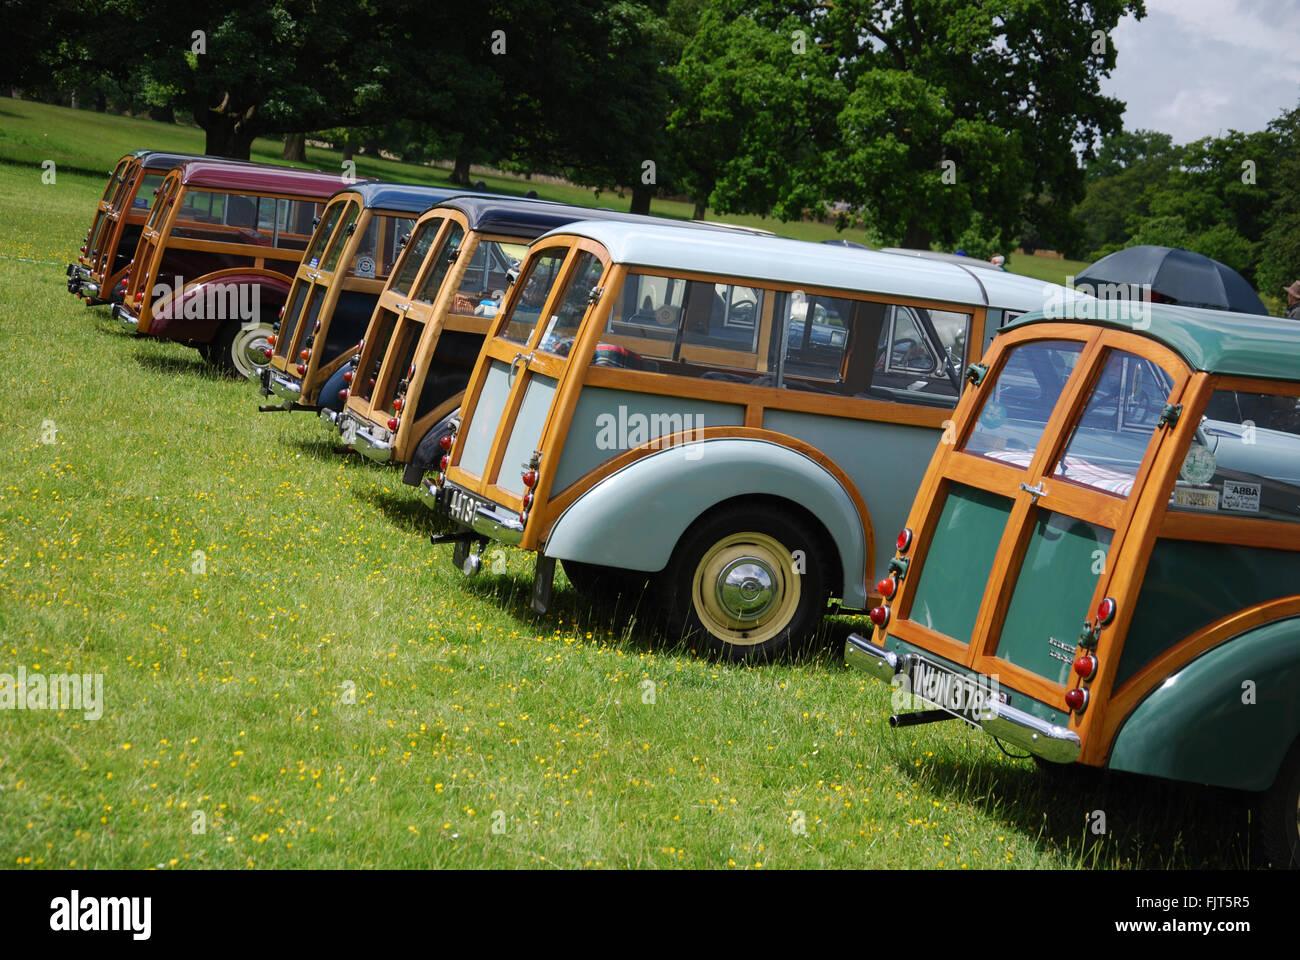 Morris Centenary celebrations at Cornbury Park, Charlbury Oxford, United Kingdom - Stock Image